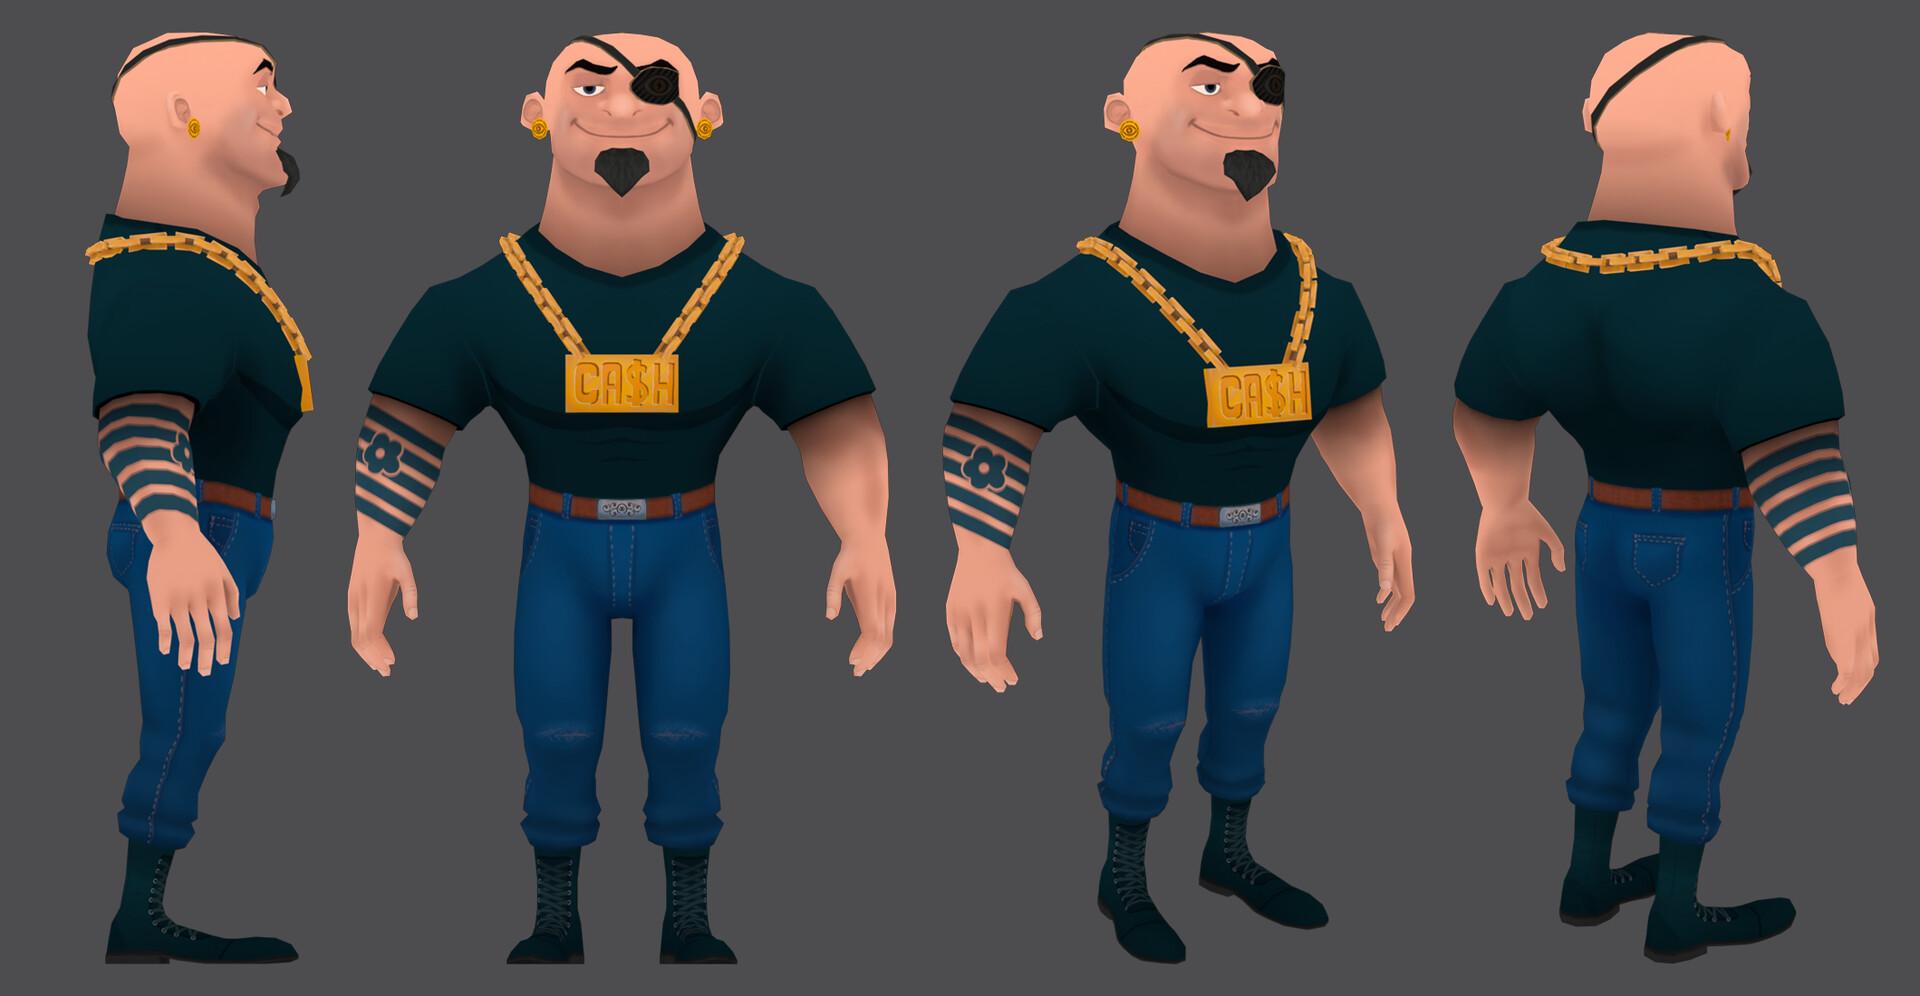 Paul foster jailbird costume01